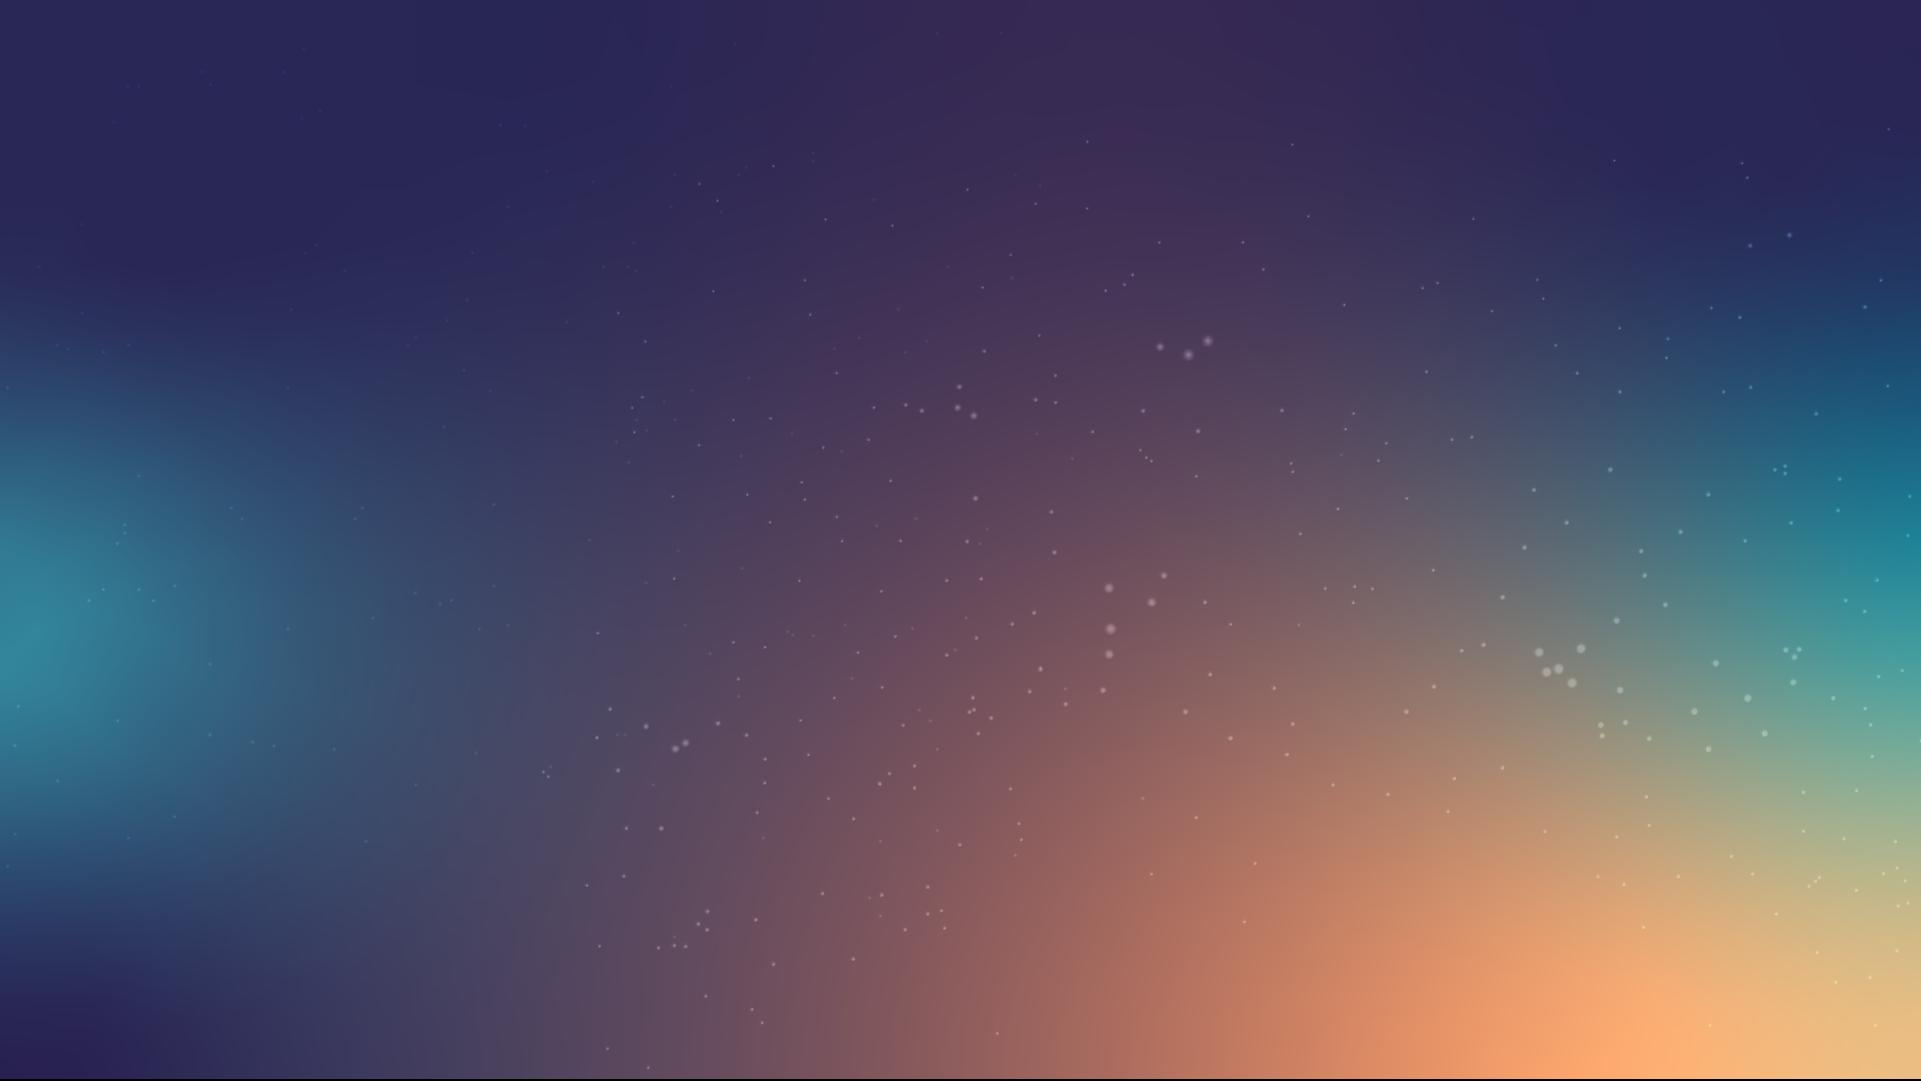 fairwinds_fairwinds_gradient_mesh_4_login_1920x1080